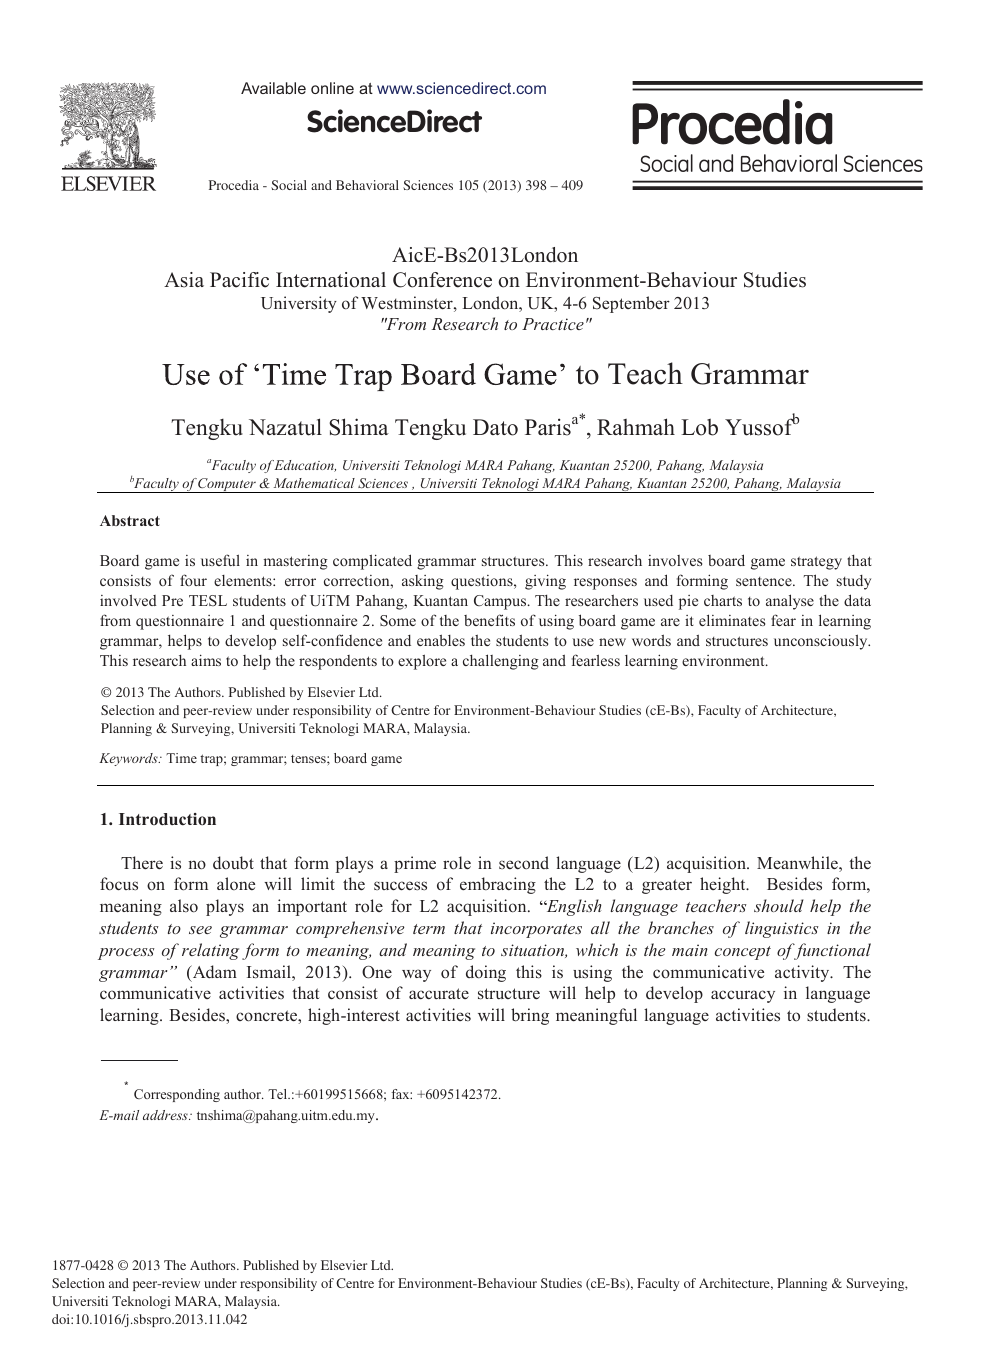 Board game research paper